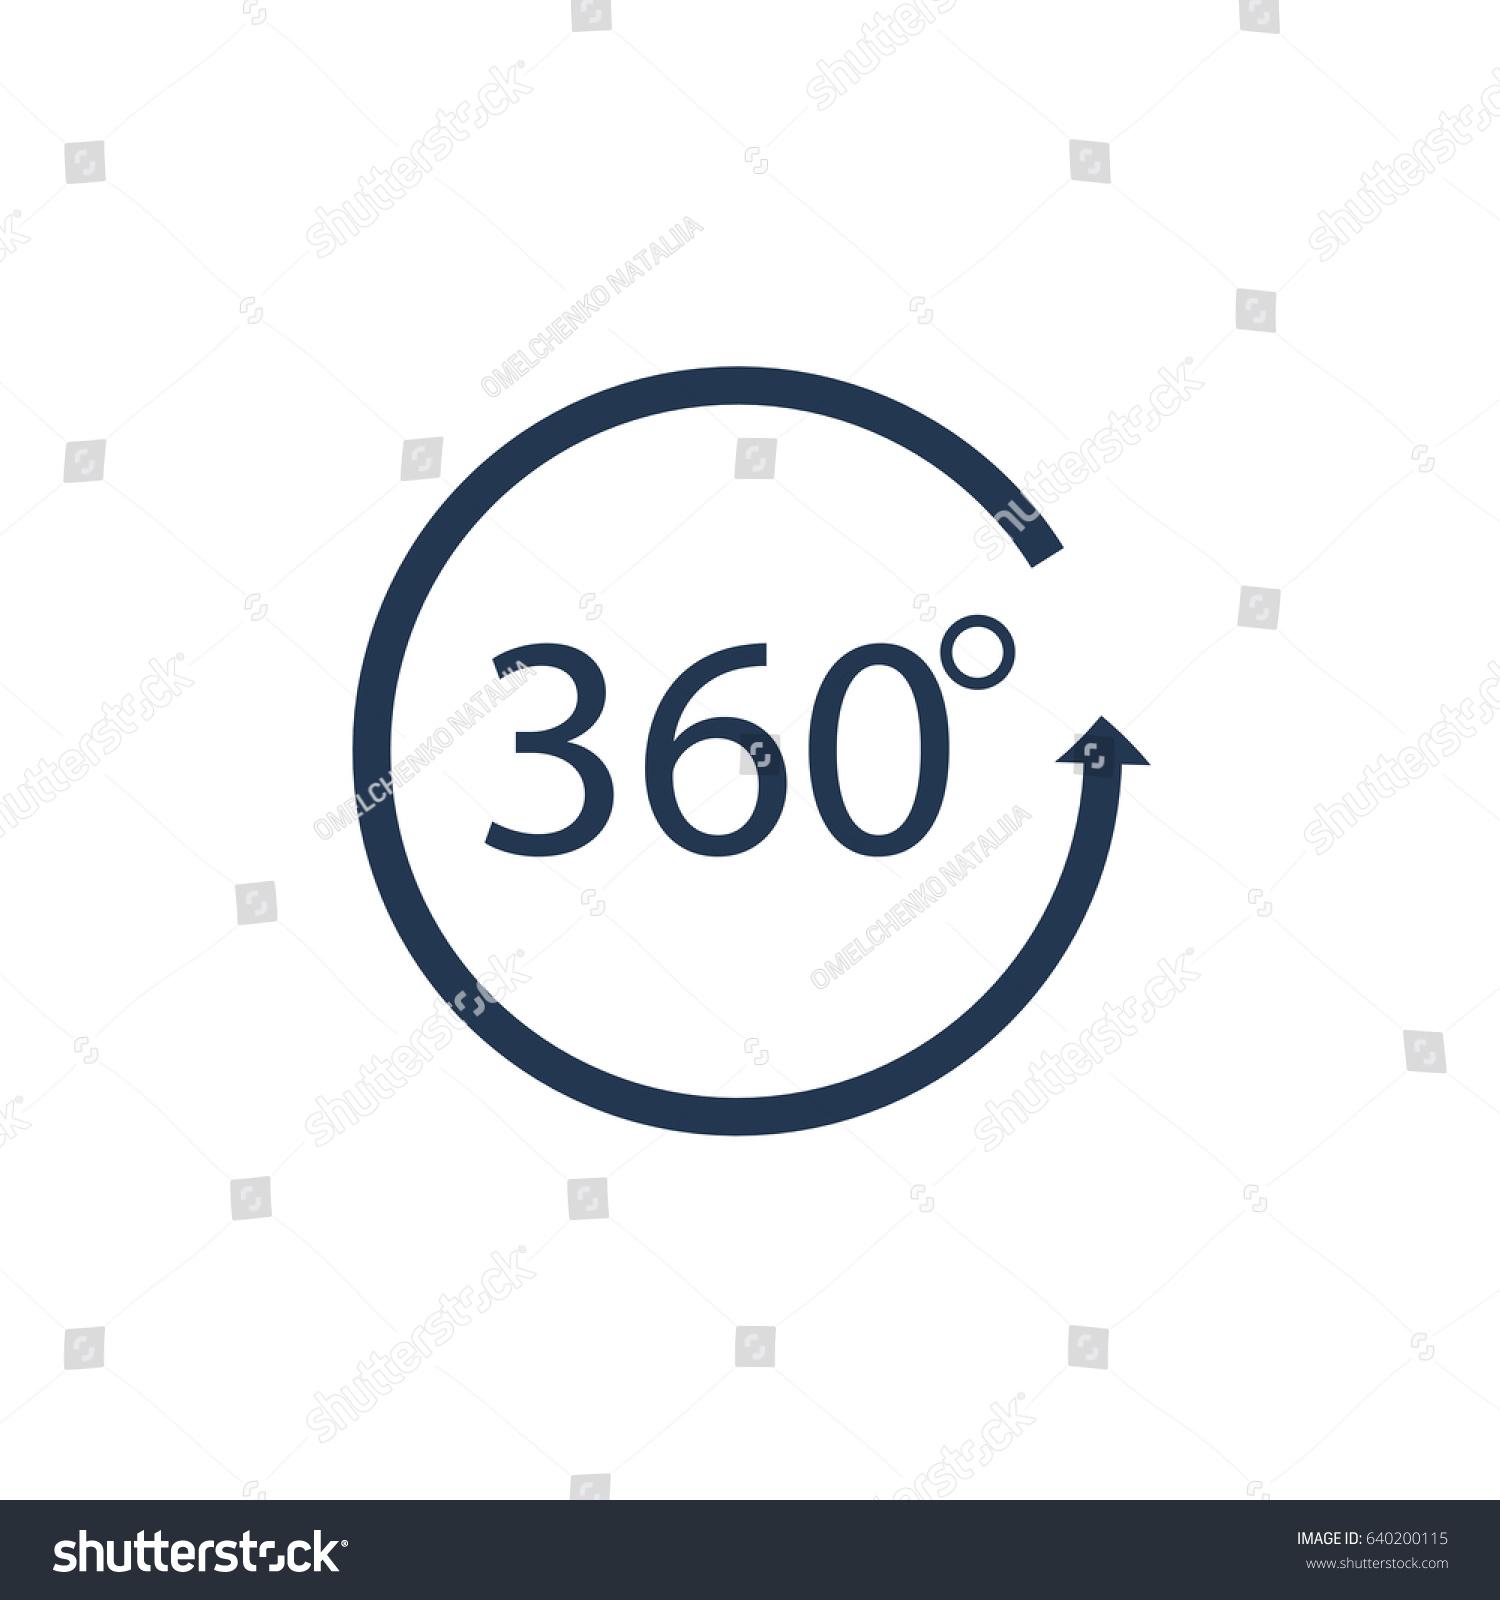 Angle 360 Degrees Sign Icon Ez Canvas